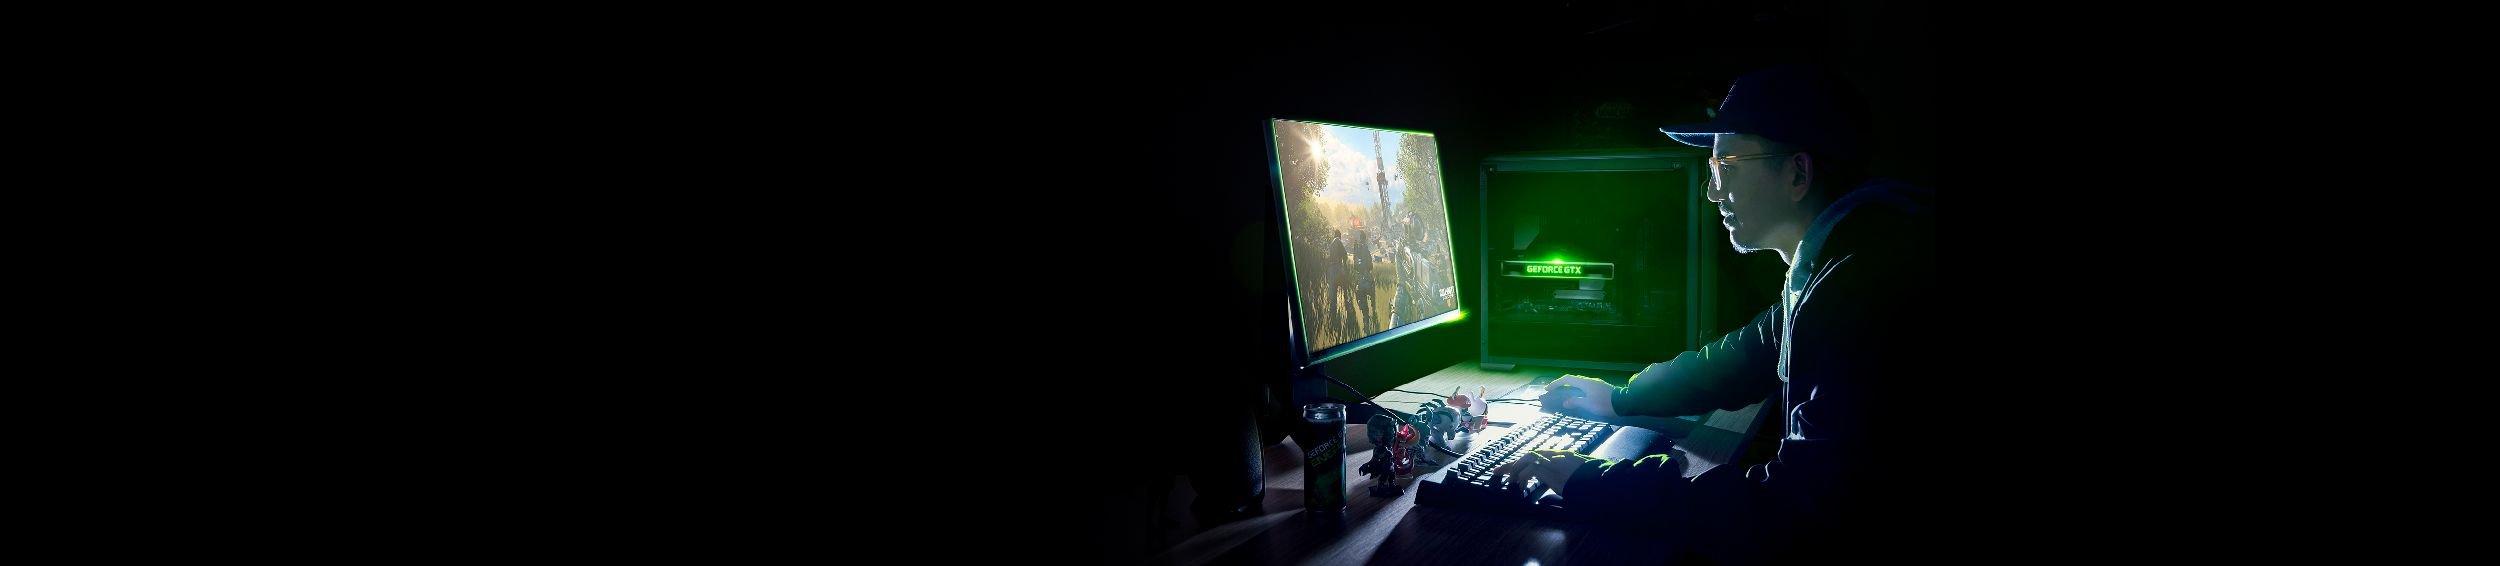 PNY GeForce GTX1650 4GB (VCG16504D6DFPPB) - фото 6130188_2019_08_06_13_22_48369055690.jpeg